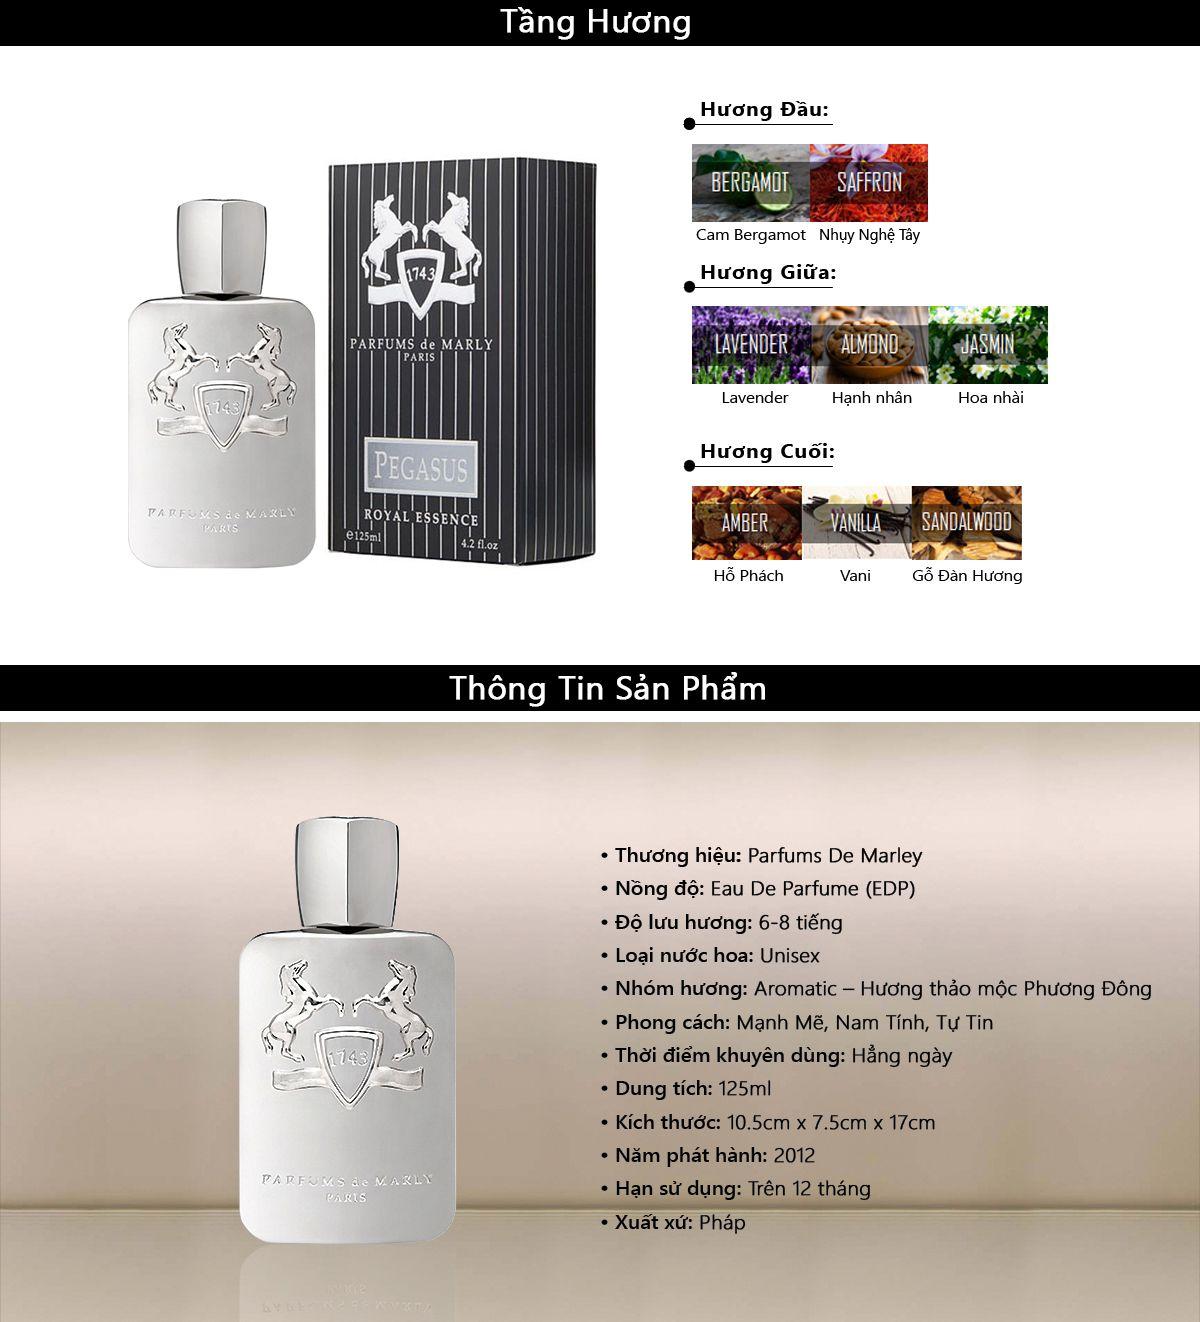 Nước Hoa Parfums De Marly Pegasus Royal Essence EDP